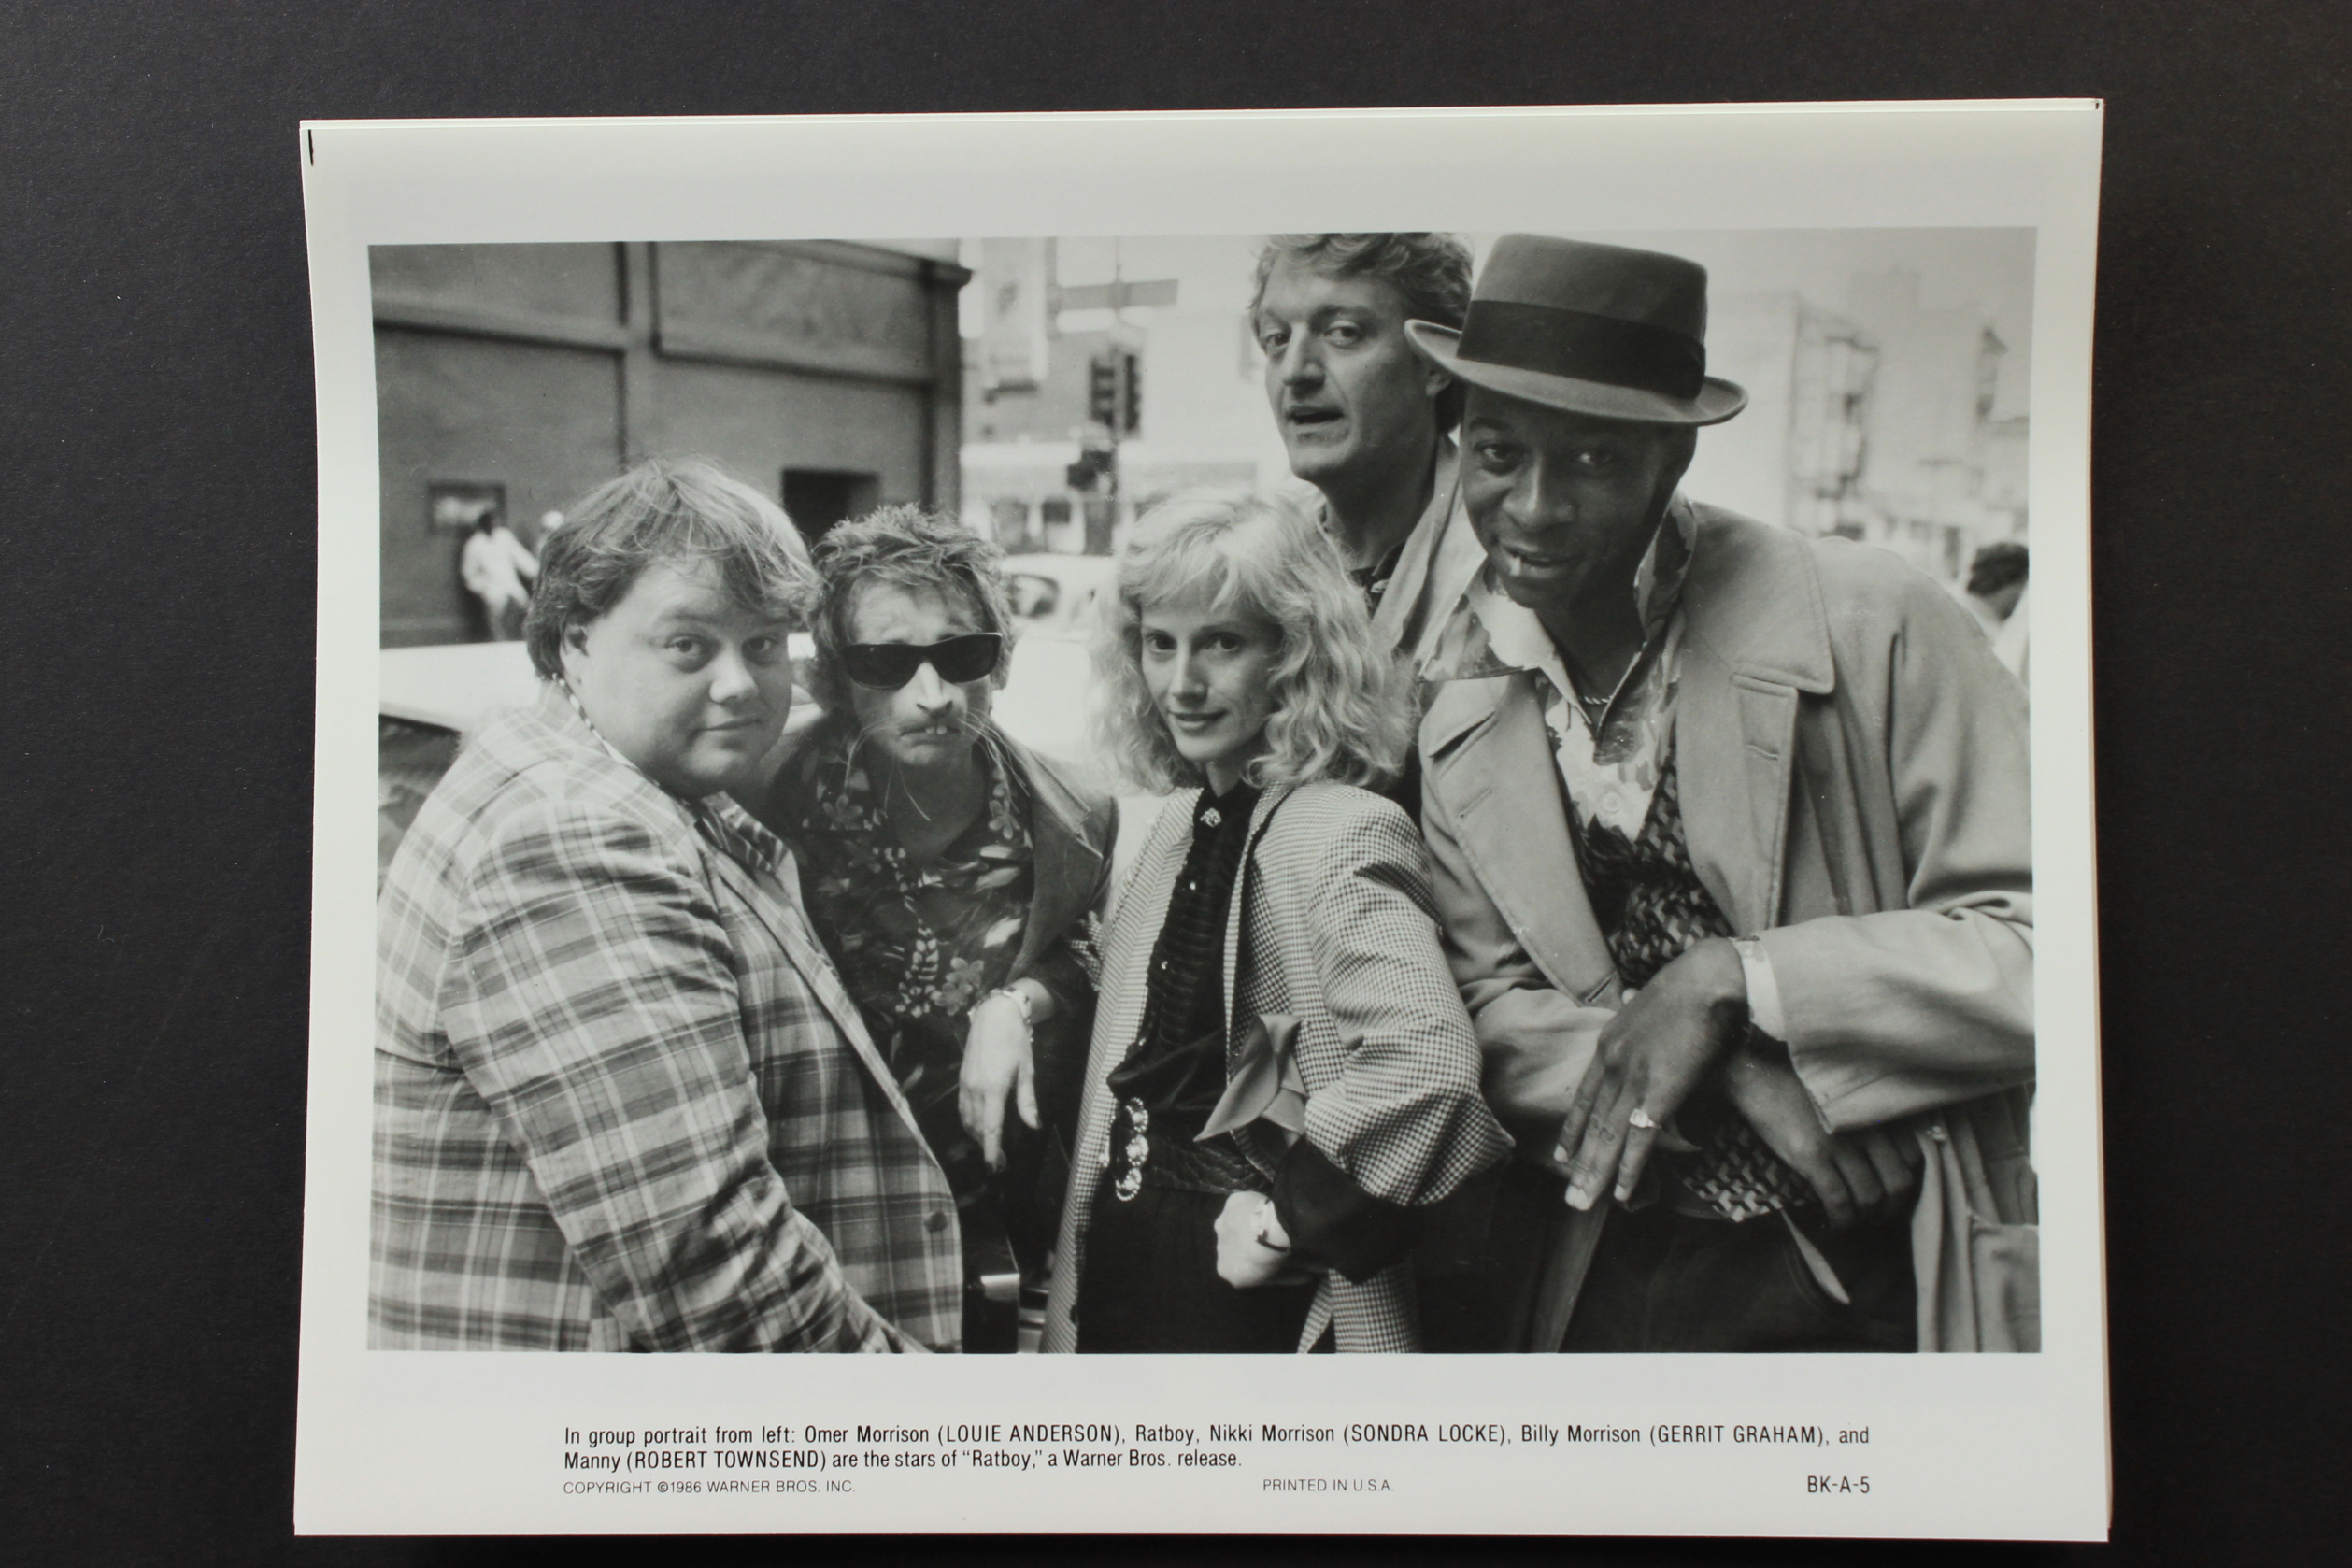 Louie Anderson, Sharon Baird, Gerrit Graham, Sondra Locke, and Robert Townsend in Ratboy (1986)